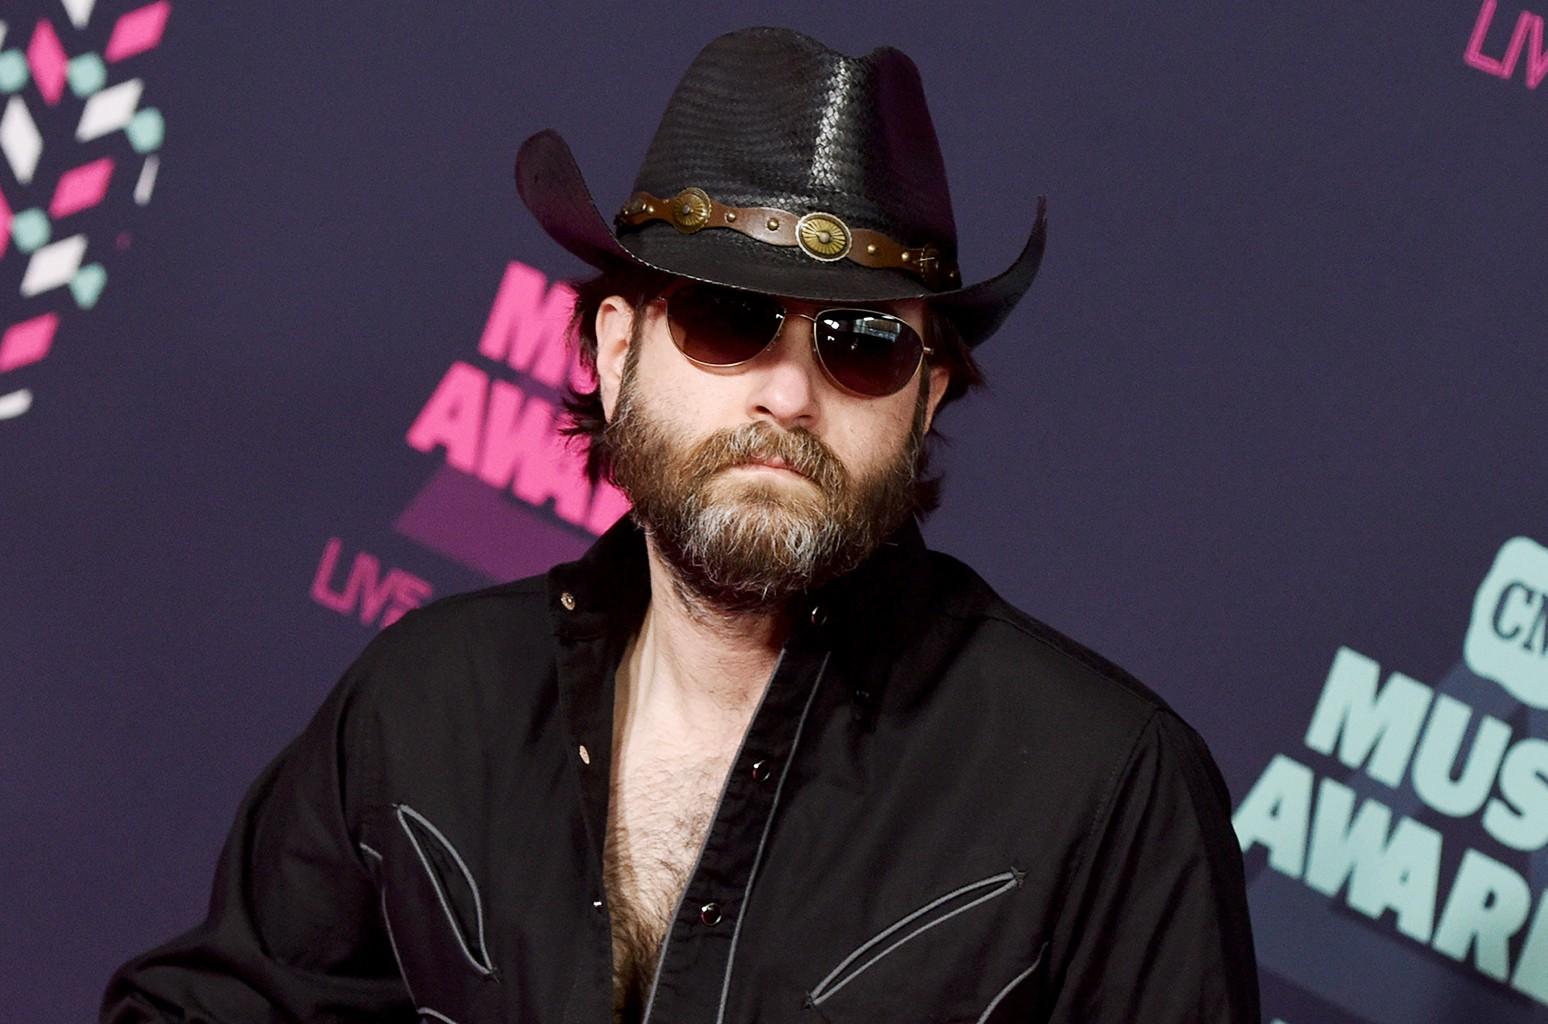 Wheeler Walker Jr. attends the 2016 CMT Music awards at the Bridgestone Arena on June 8, 2016 in Nashville, Tenn.